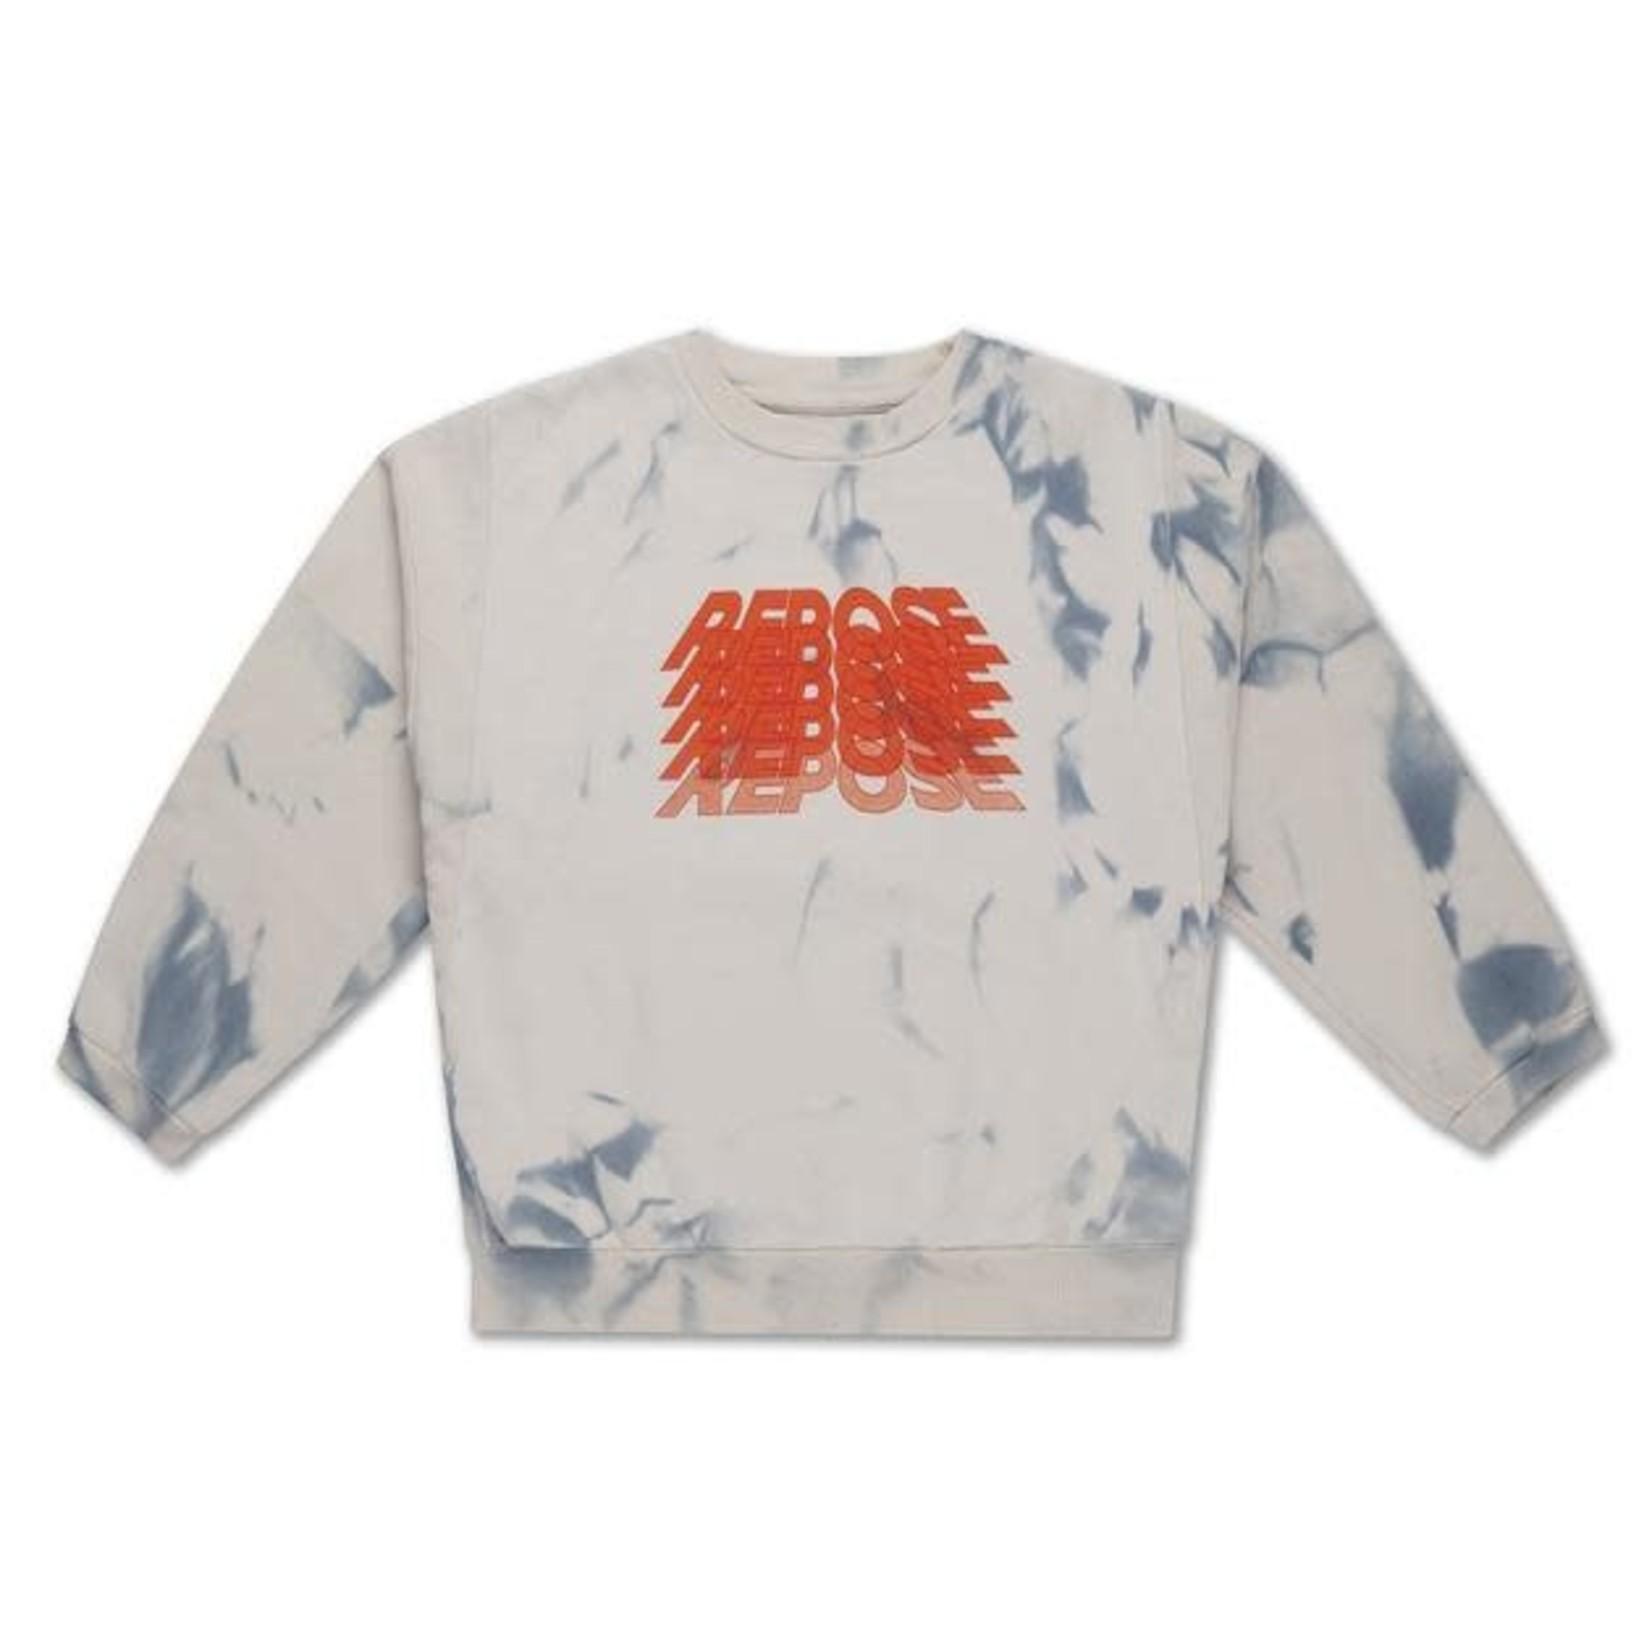 REPOSE AMS REPOSE sweater